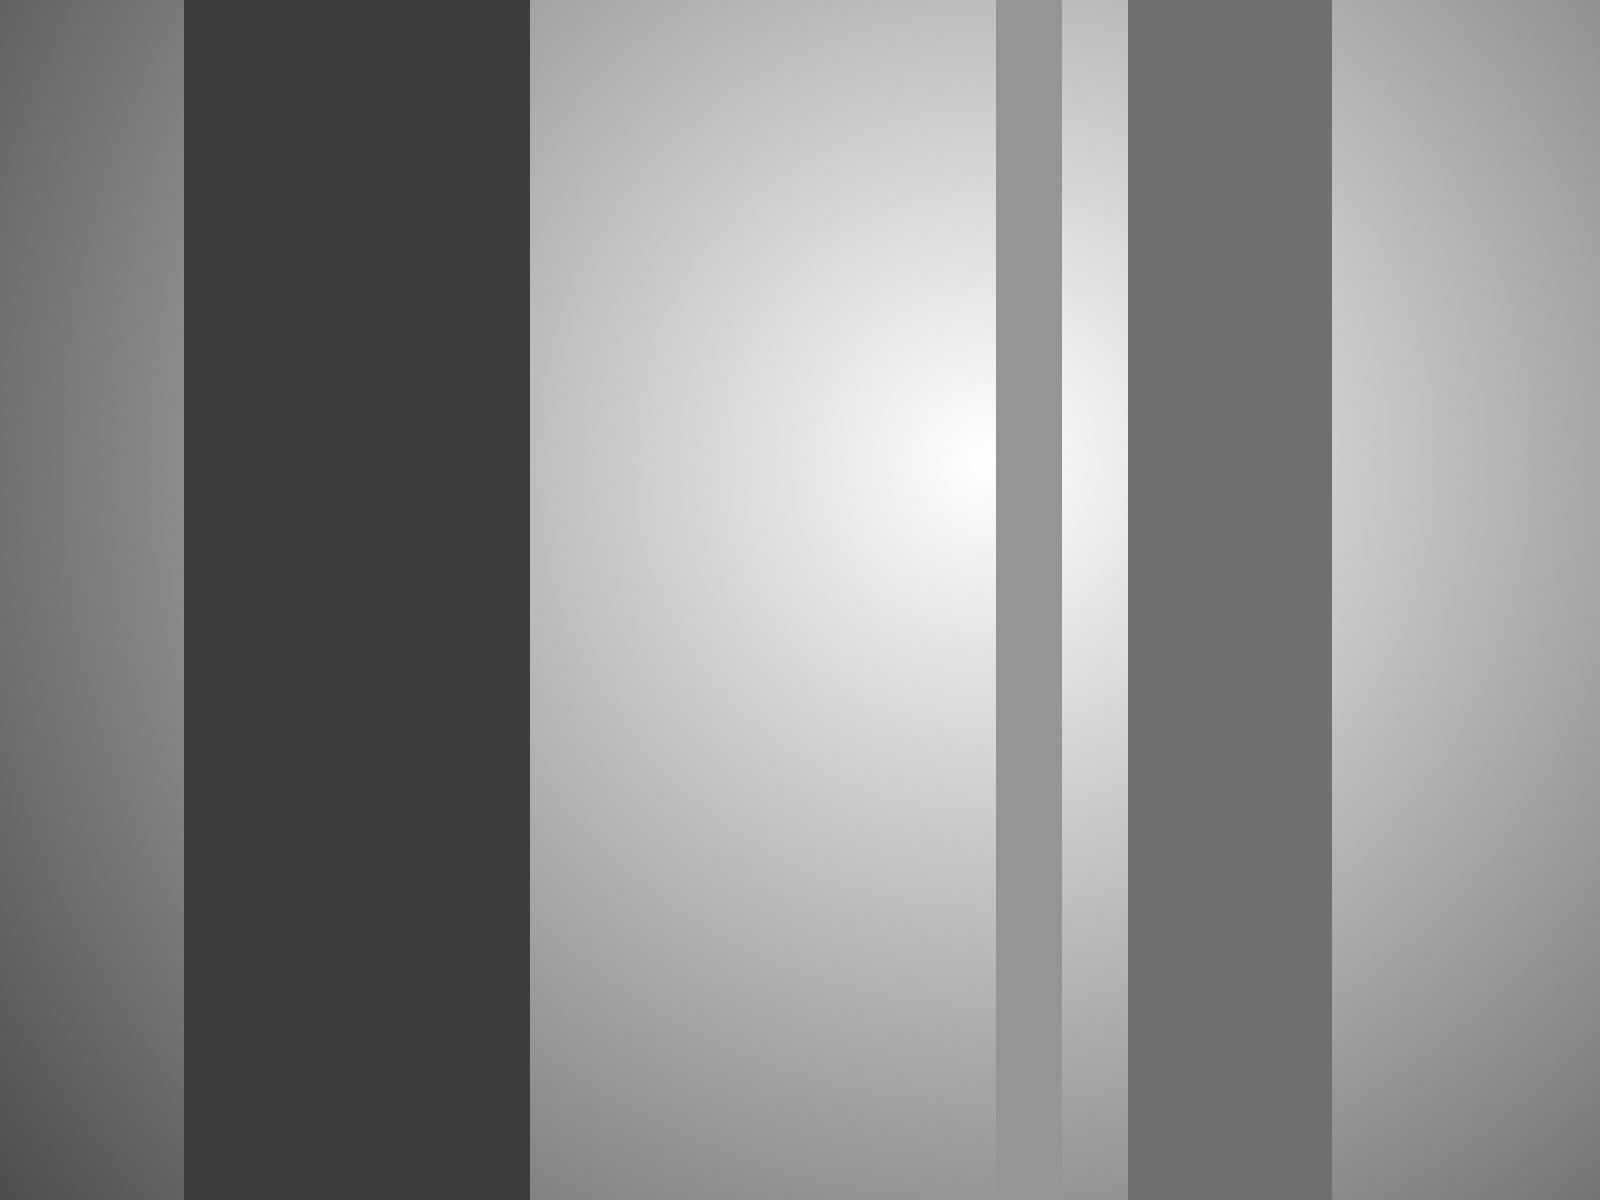 grey stripes computer wallpapers desktop backgrounds